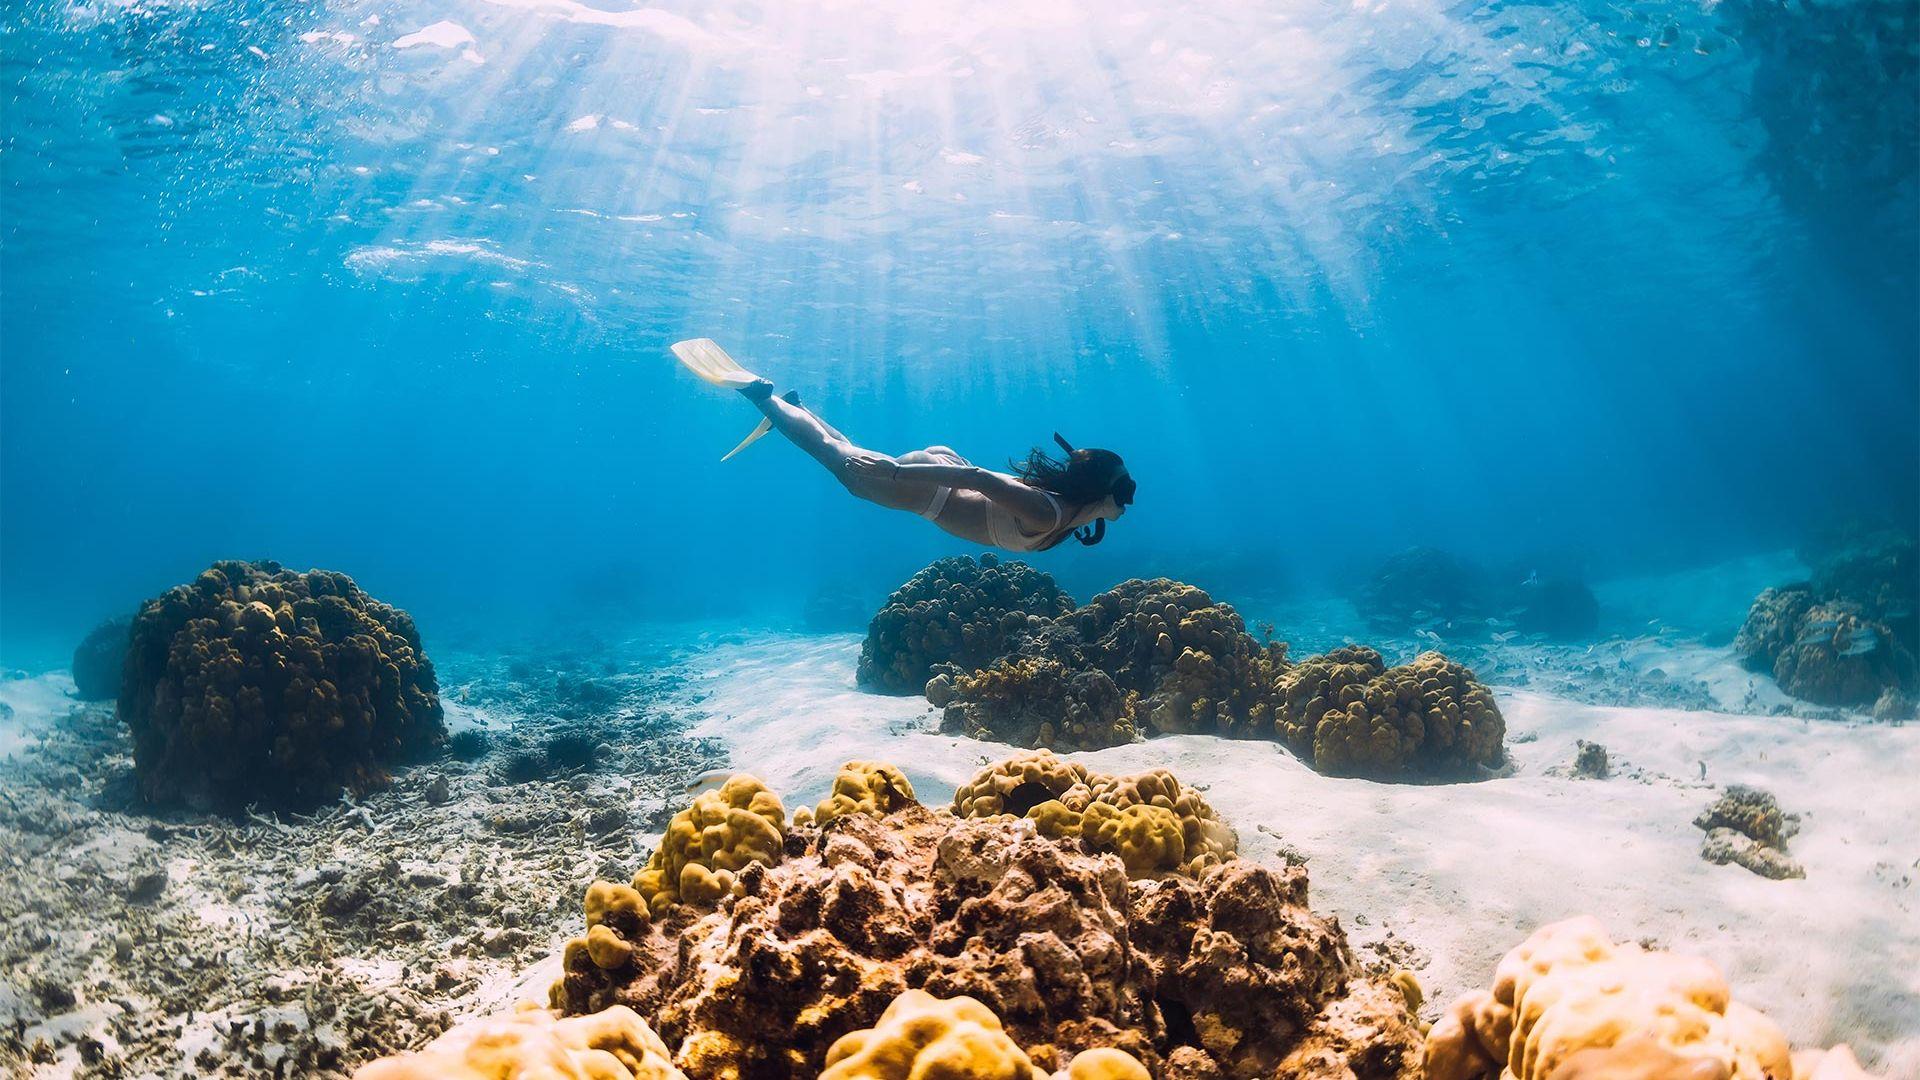 Sejur plaja Mauritius, 10 zile - 03 februarie 2022